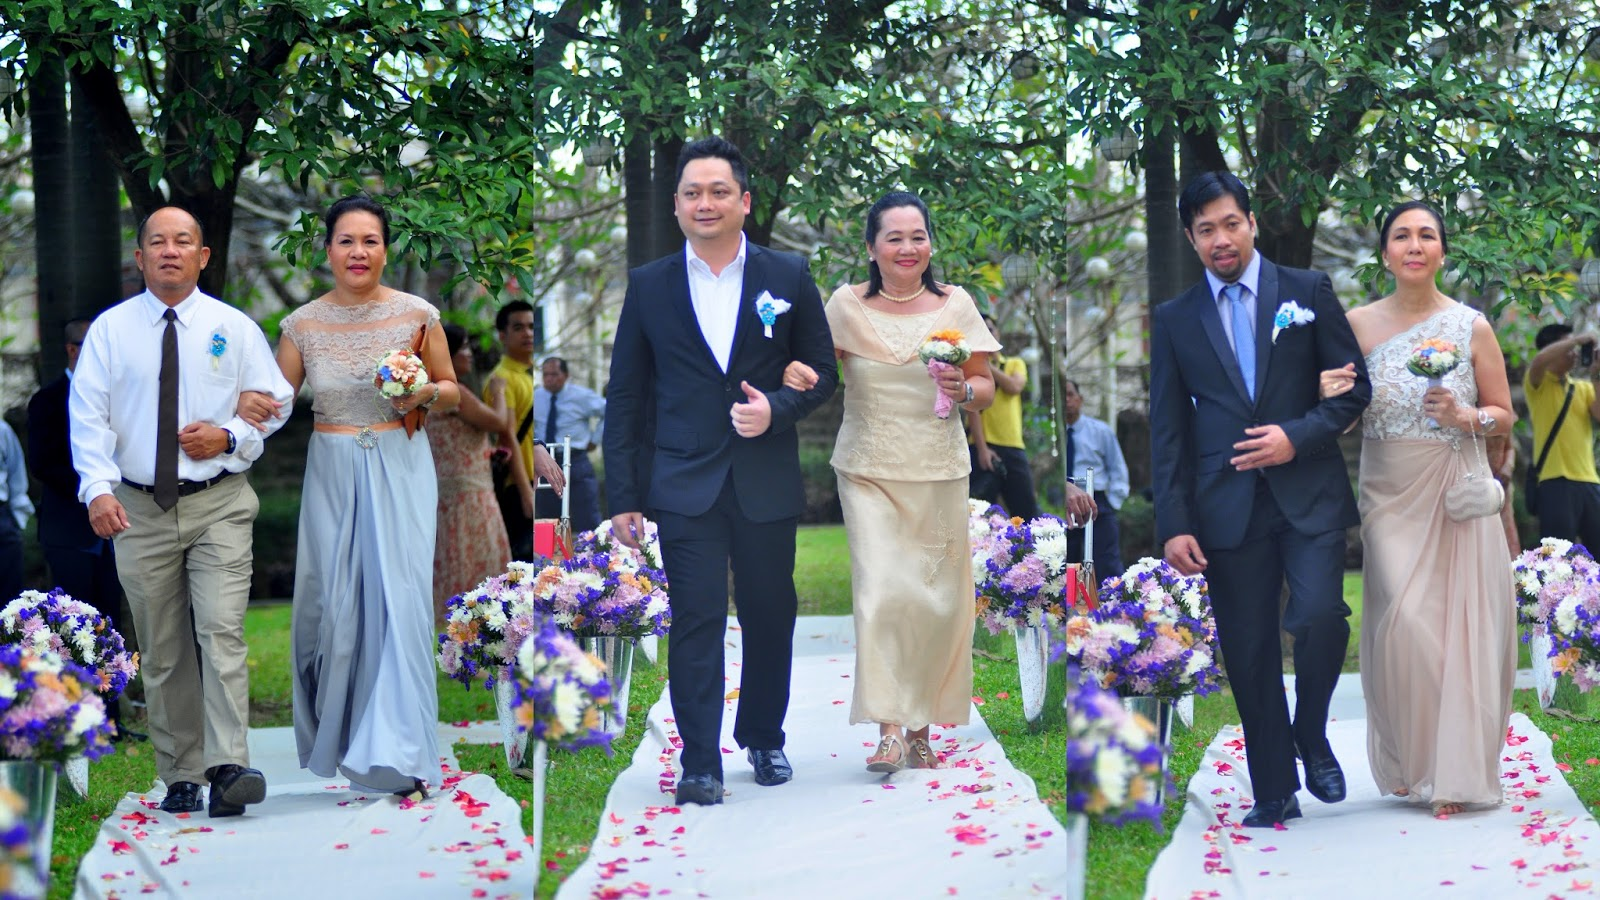 Principal Wedding Sponsor Gowns: Bubble Milk Tea Half-Sugar Diary!: Our Beautiful Wedding